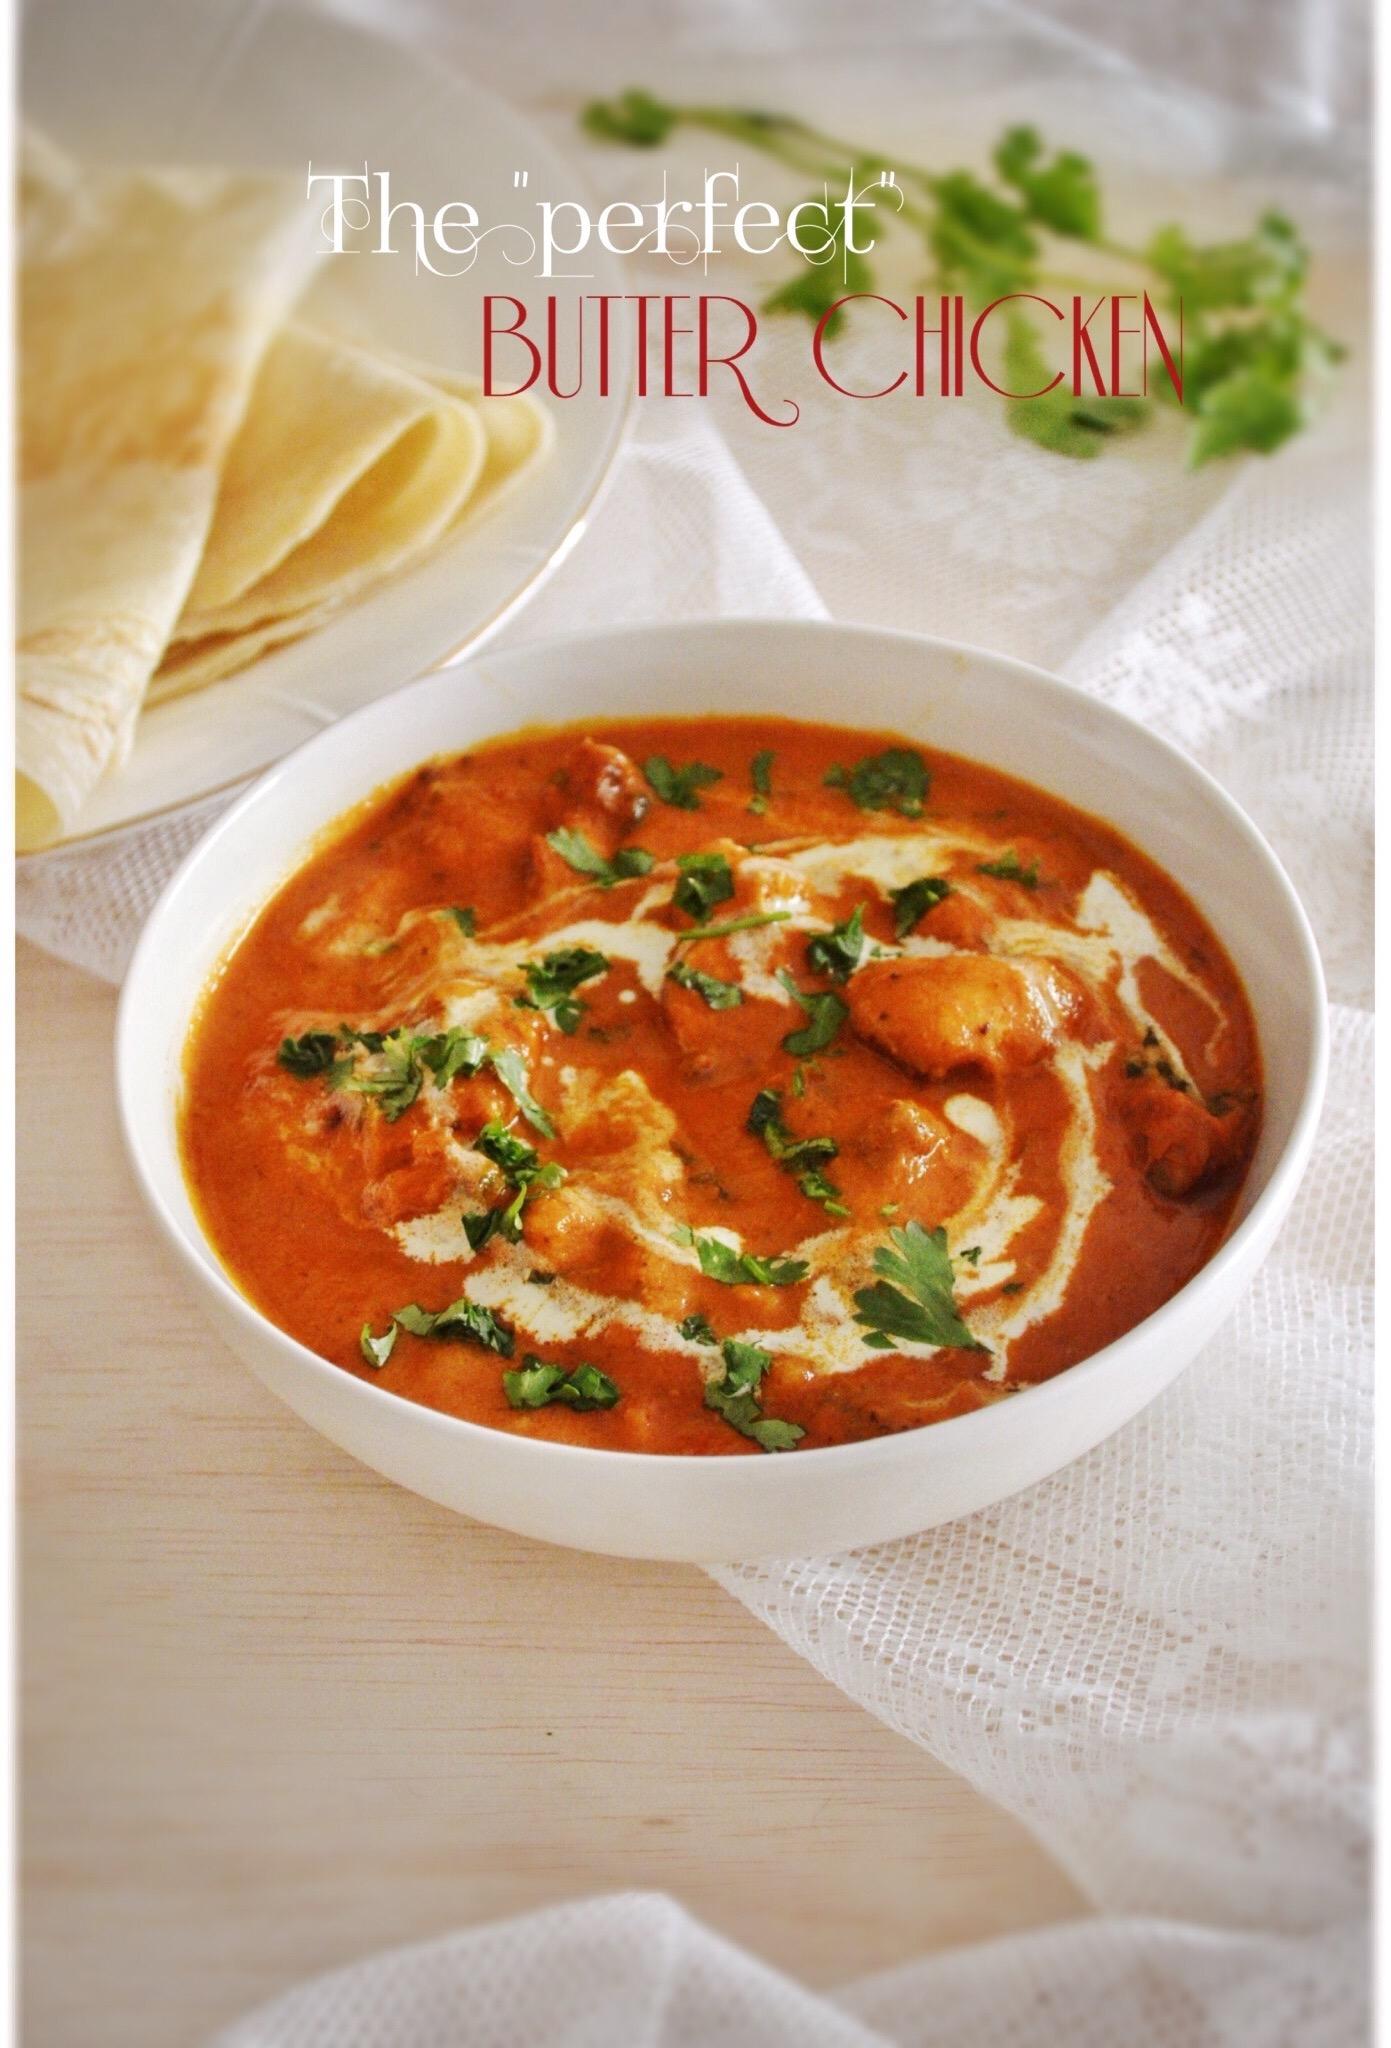 Chilli Chicken Recipe l ചില്ലി ചിക്കൻ - YouTube